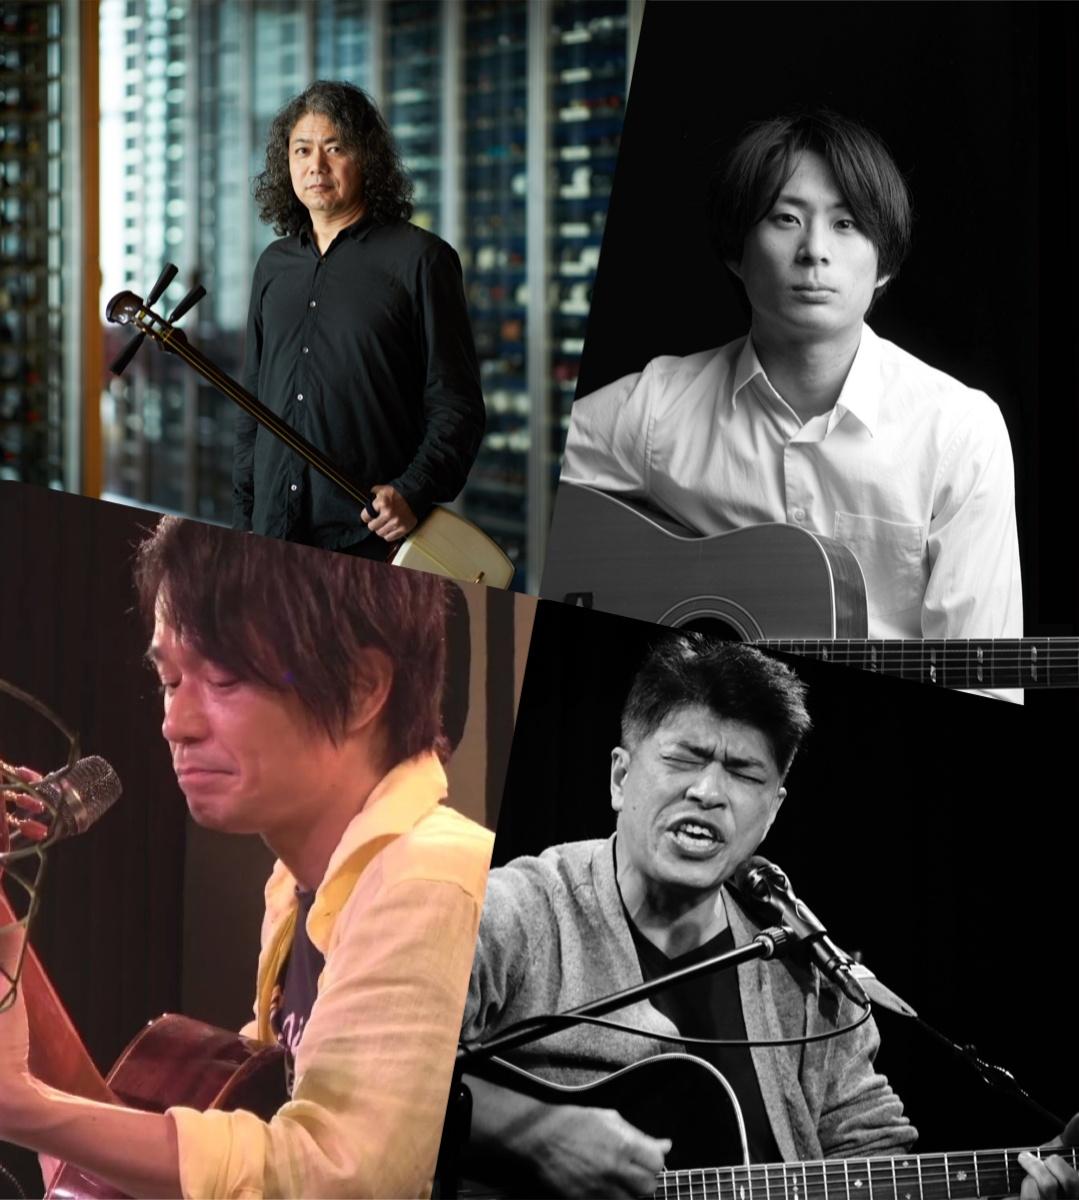 『Singin' Gypsies』出演:山影匡瑠×José / 高瀬舜 / 局洋次郎 / 栁下学